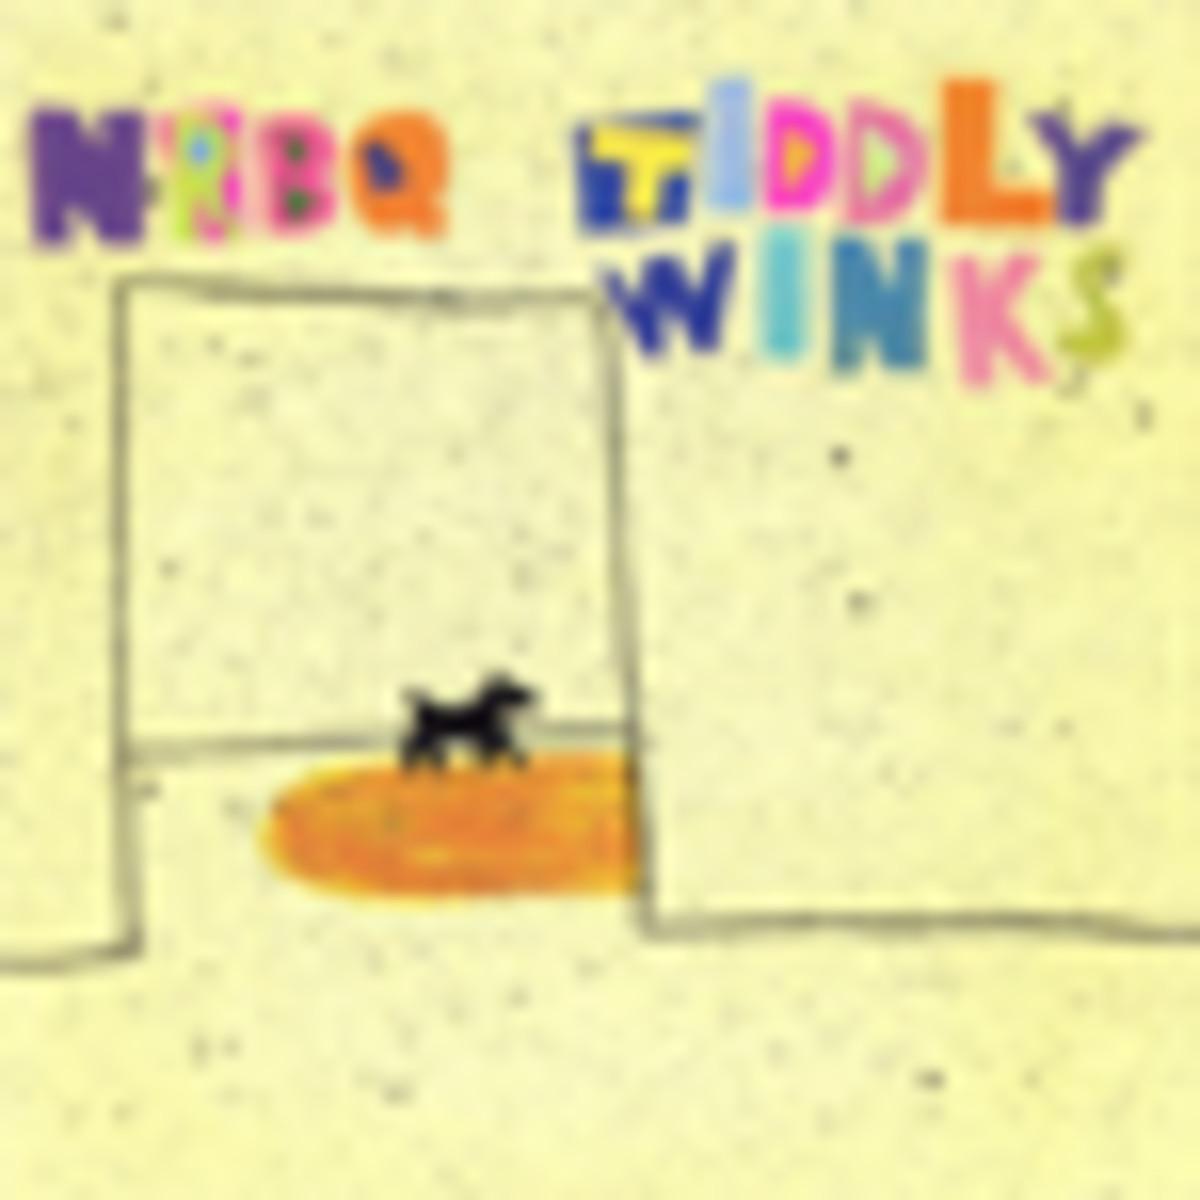 NRBQ Tiddlywink album